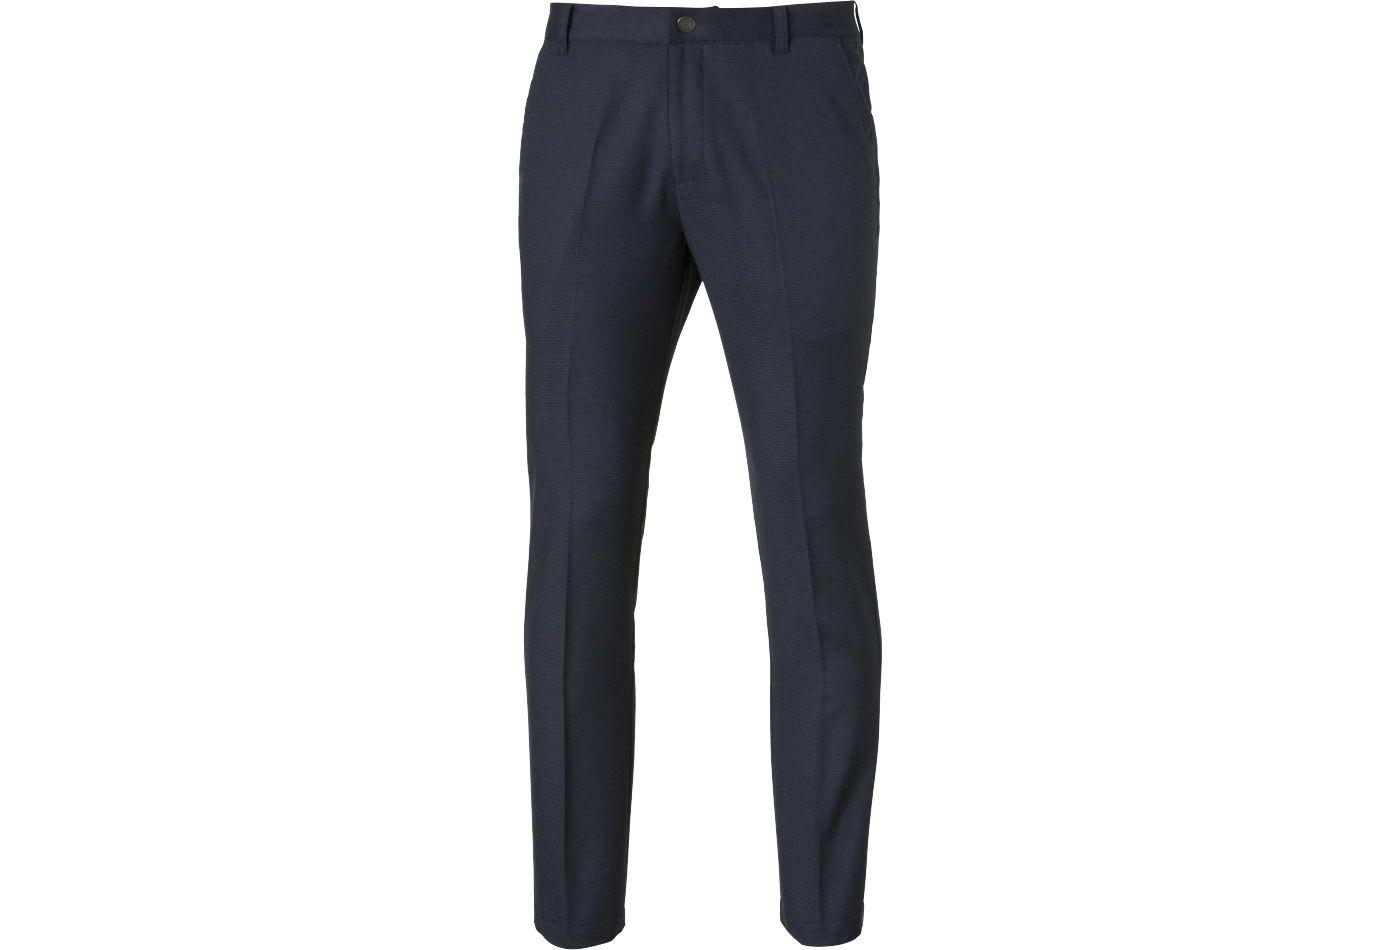 PUMA Men's Antrim Golf Pants